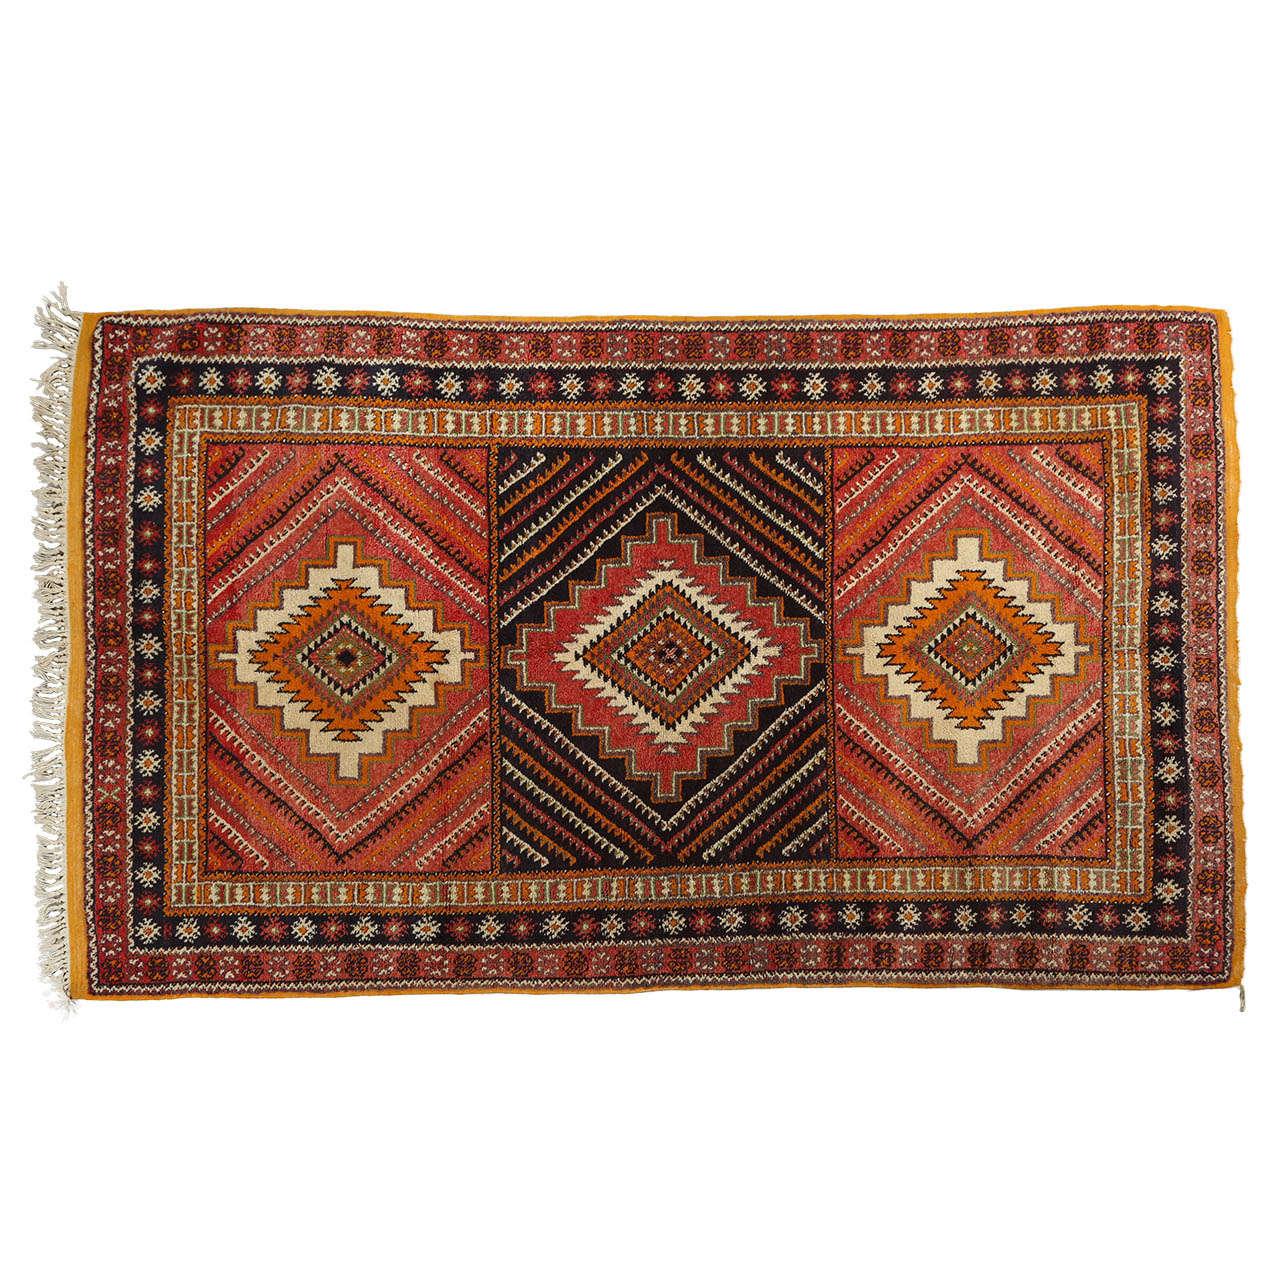 Moroccan Tribal Rug For Sale At 1stdibs